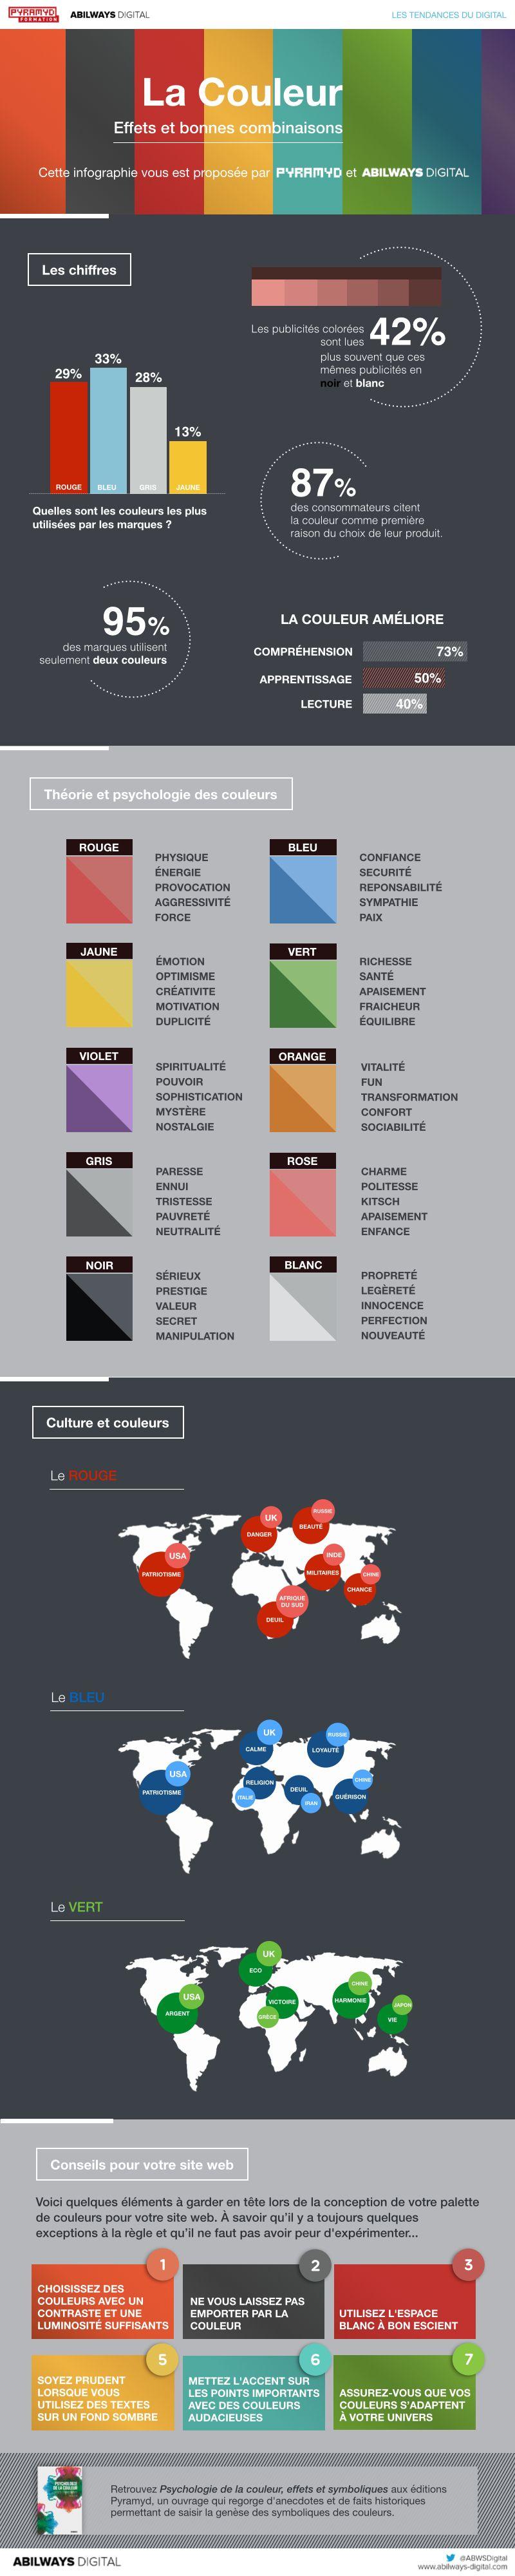 Infographie Couleurs Digital Jpg 800 4000 Psychologie Des Couleurs Infographie Psychologie